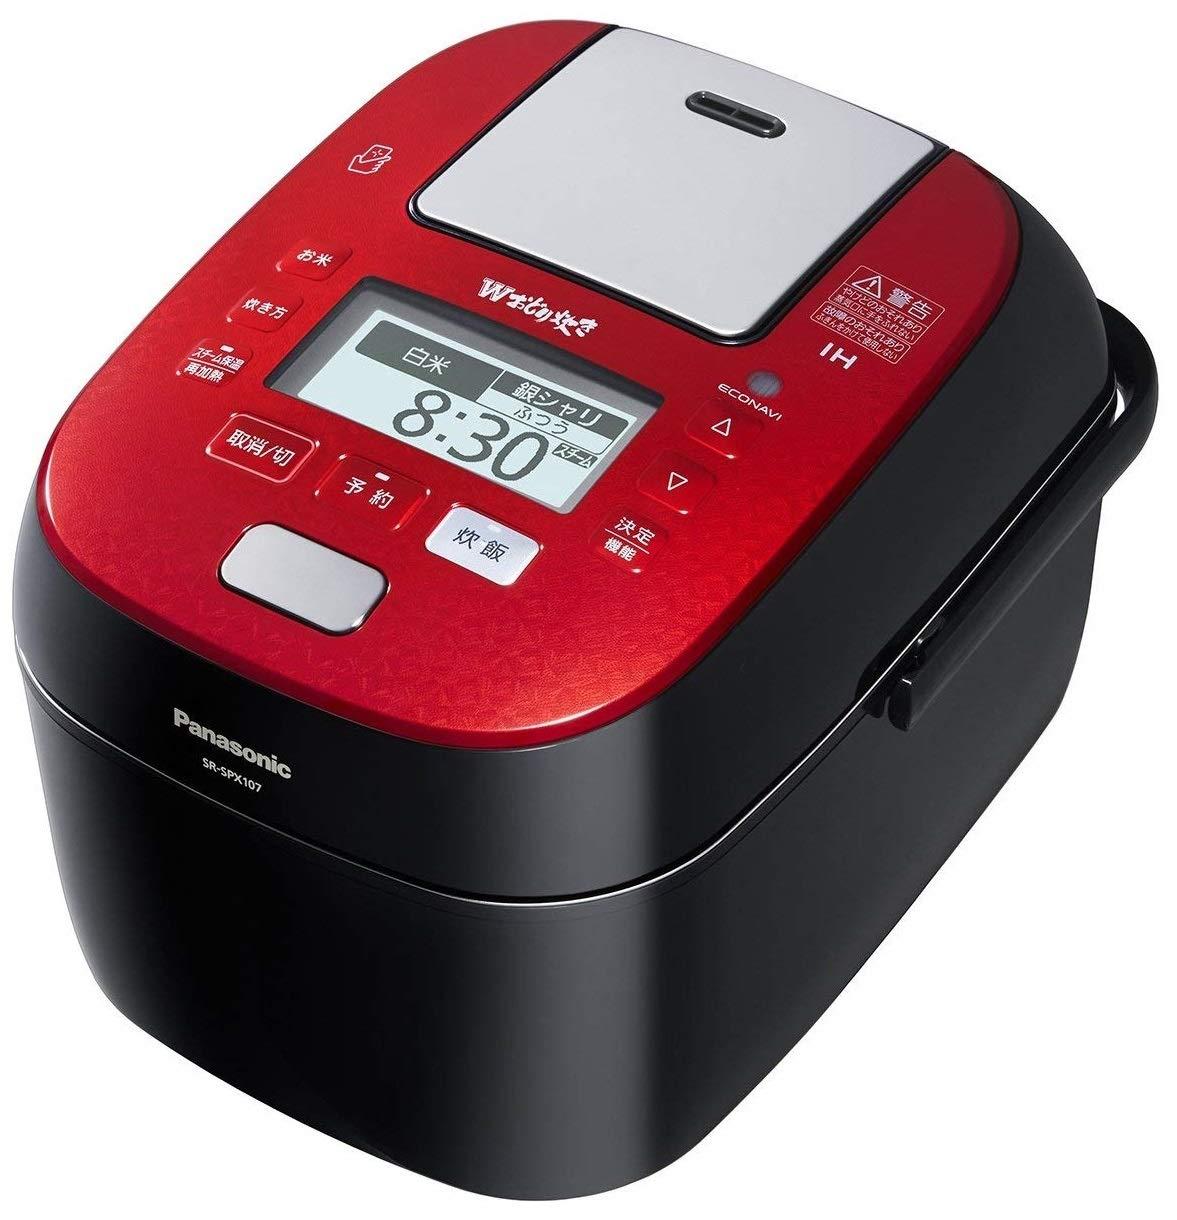 Panasonic スチーム&可変圧力IHジャー炊飯器 SR-SPX107